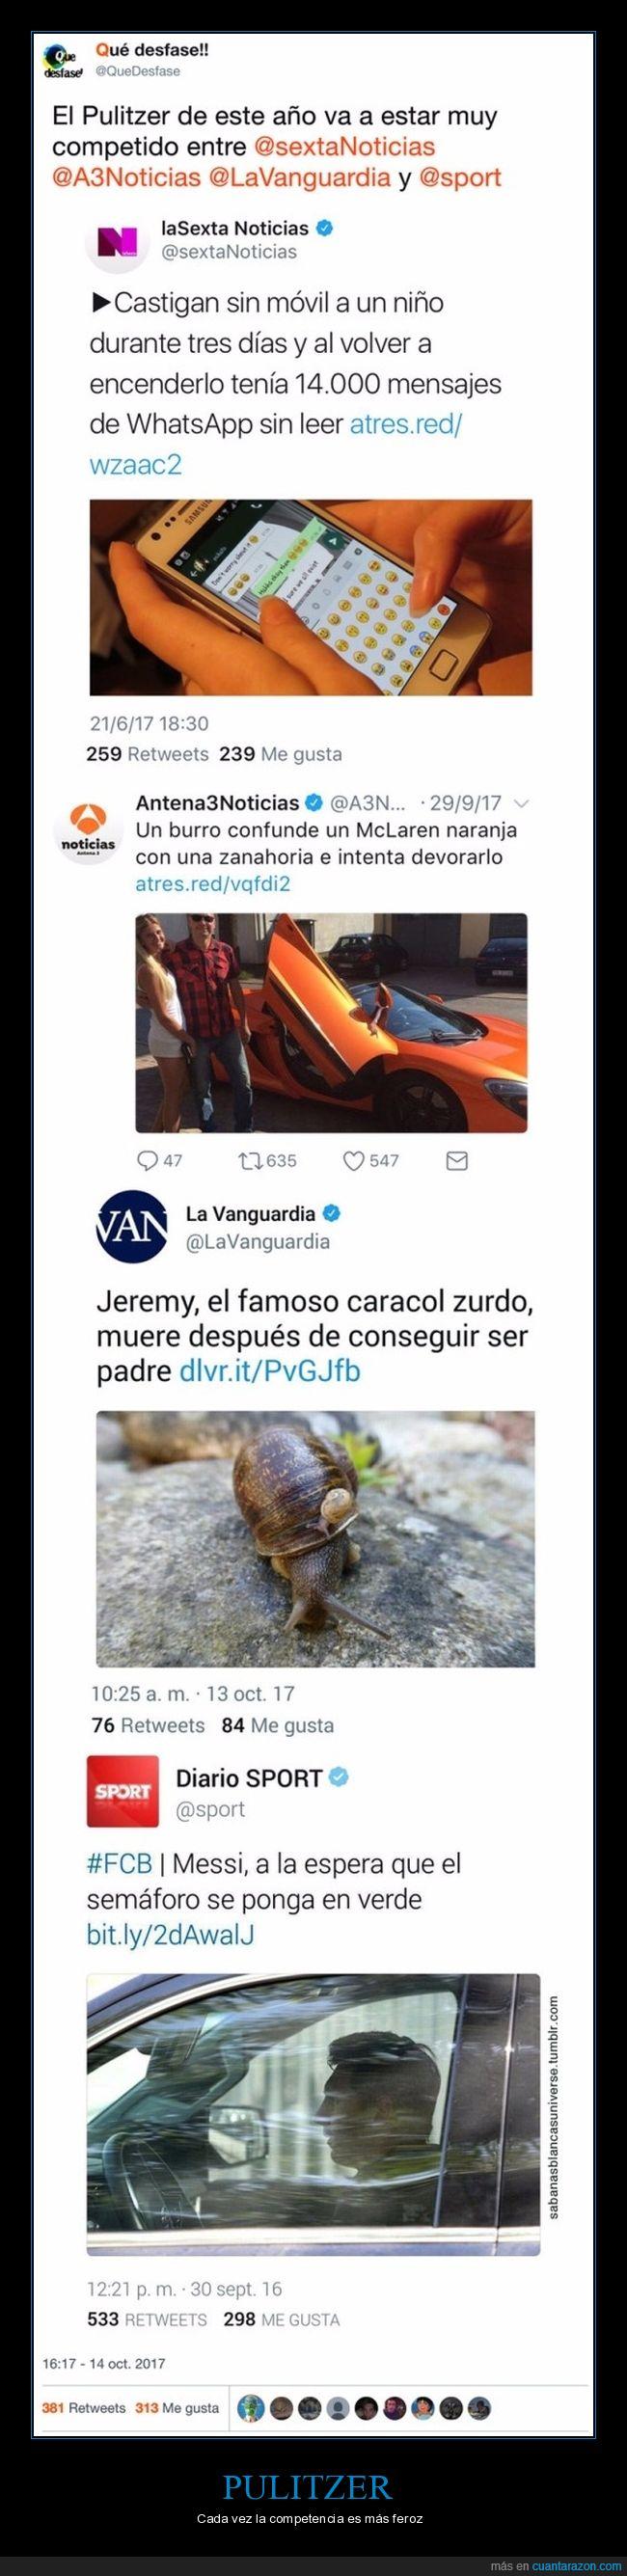 noticias,periodismo del bueno,pulitzer,titulares